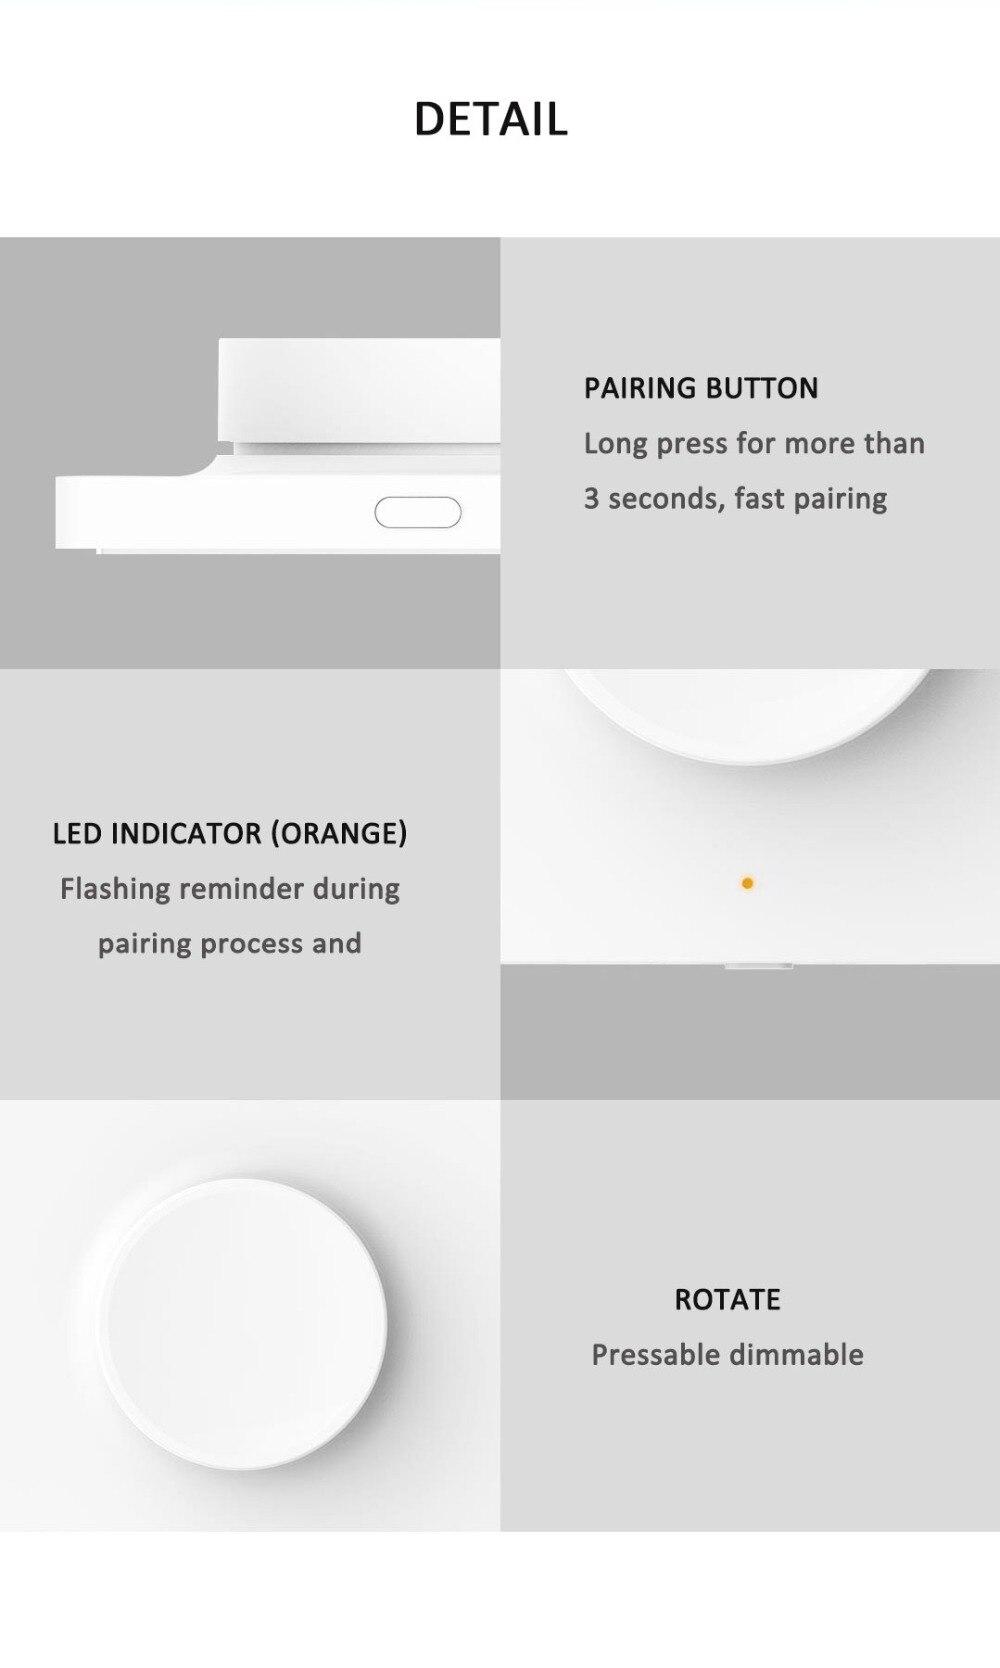 interruptor de parede sem fio bluetooth controle remoto para yeelight luz teto